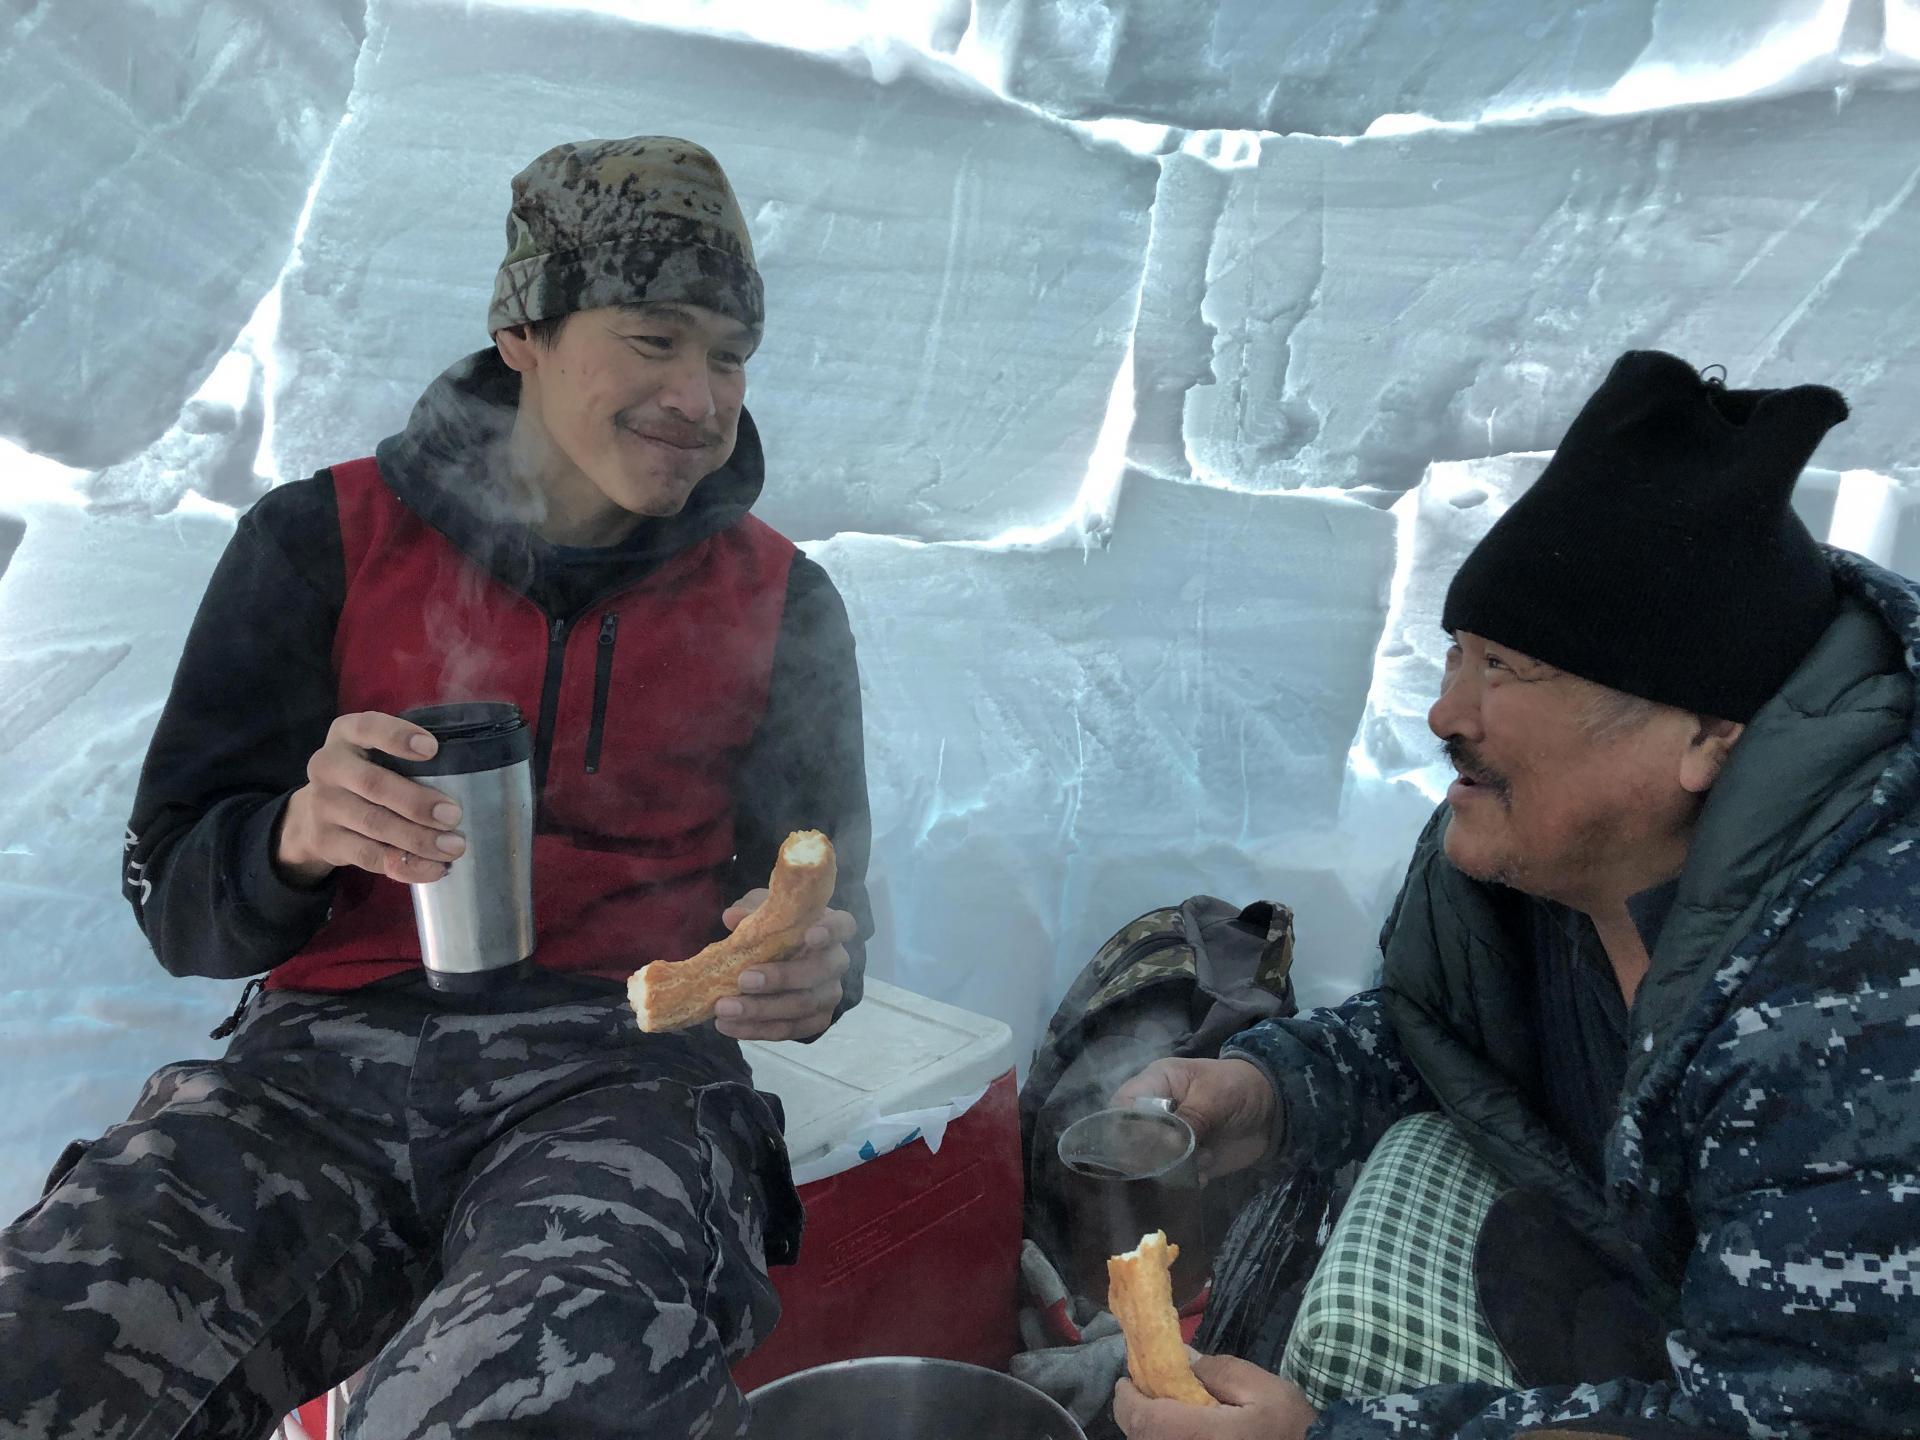 Qalingo Sivurapak and Inukpak Itukallak enjoy bannock in an igloo in Nunavik